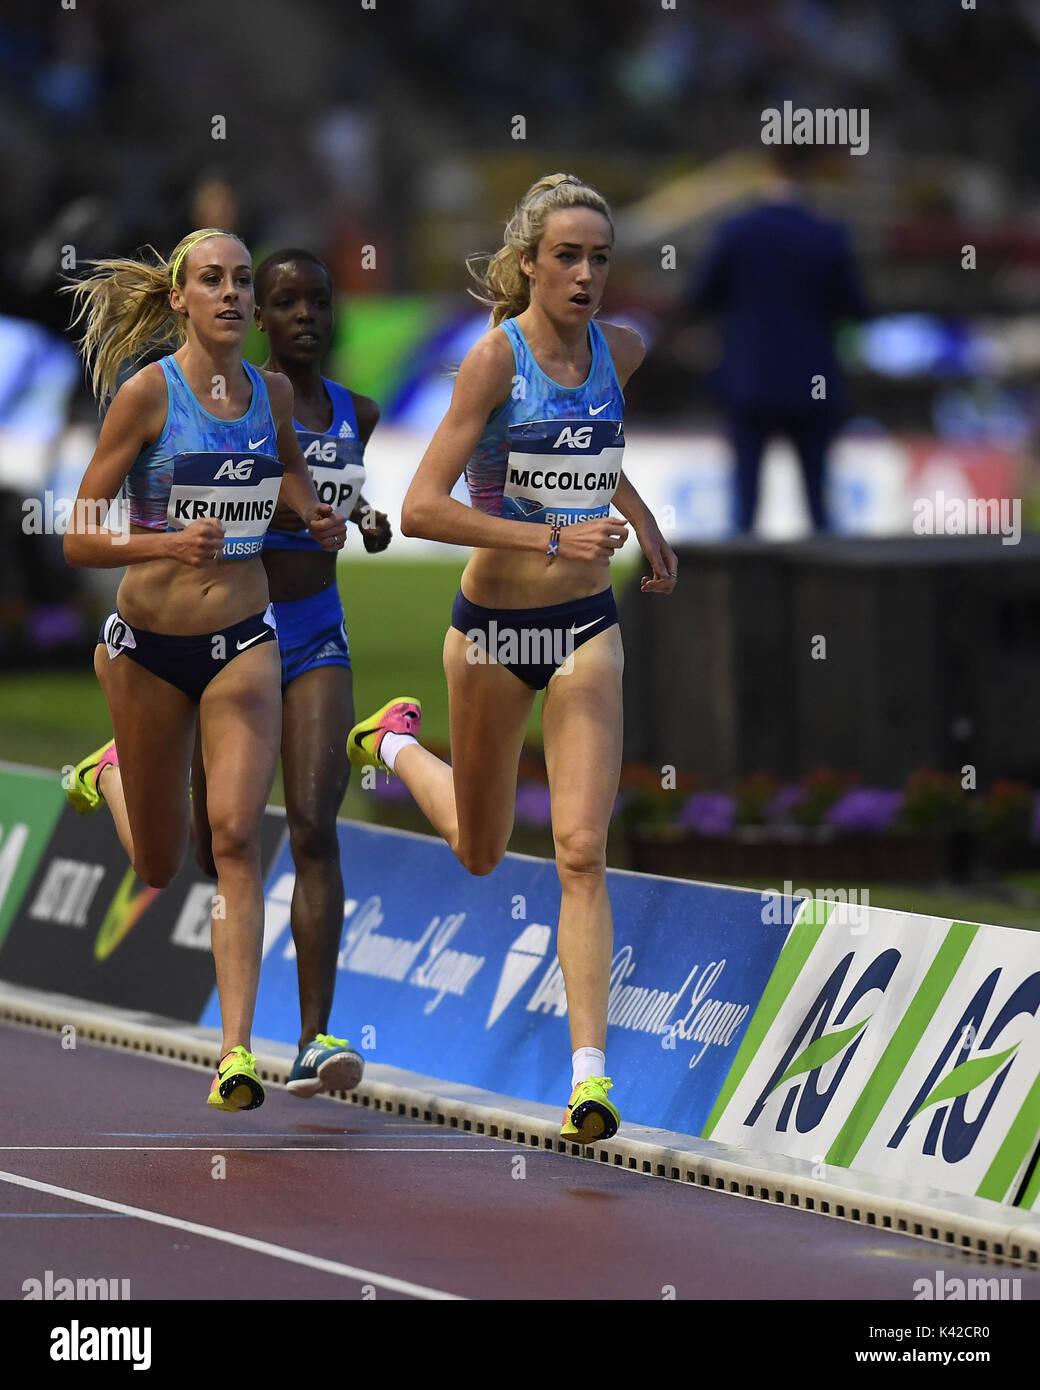 Eilish McColgan in 5000m action during IAAF Diamond League at King Baudouin Stadium Brussels Belgium on September Stock Photo